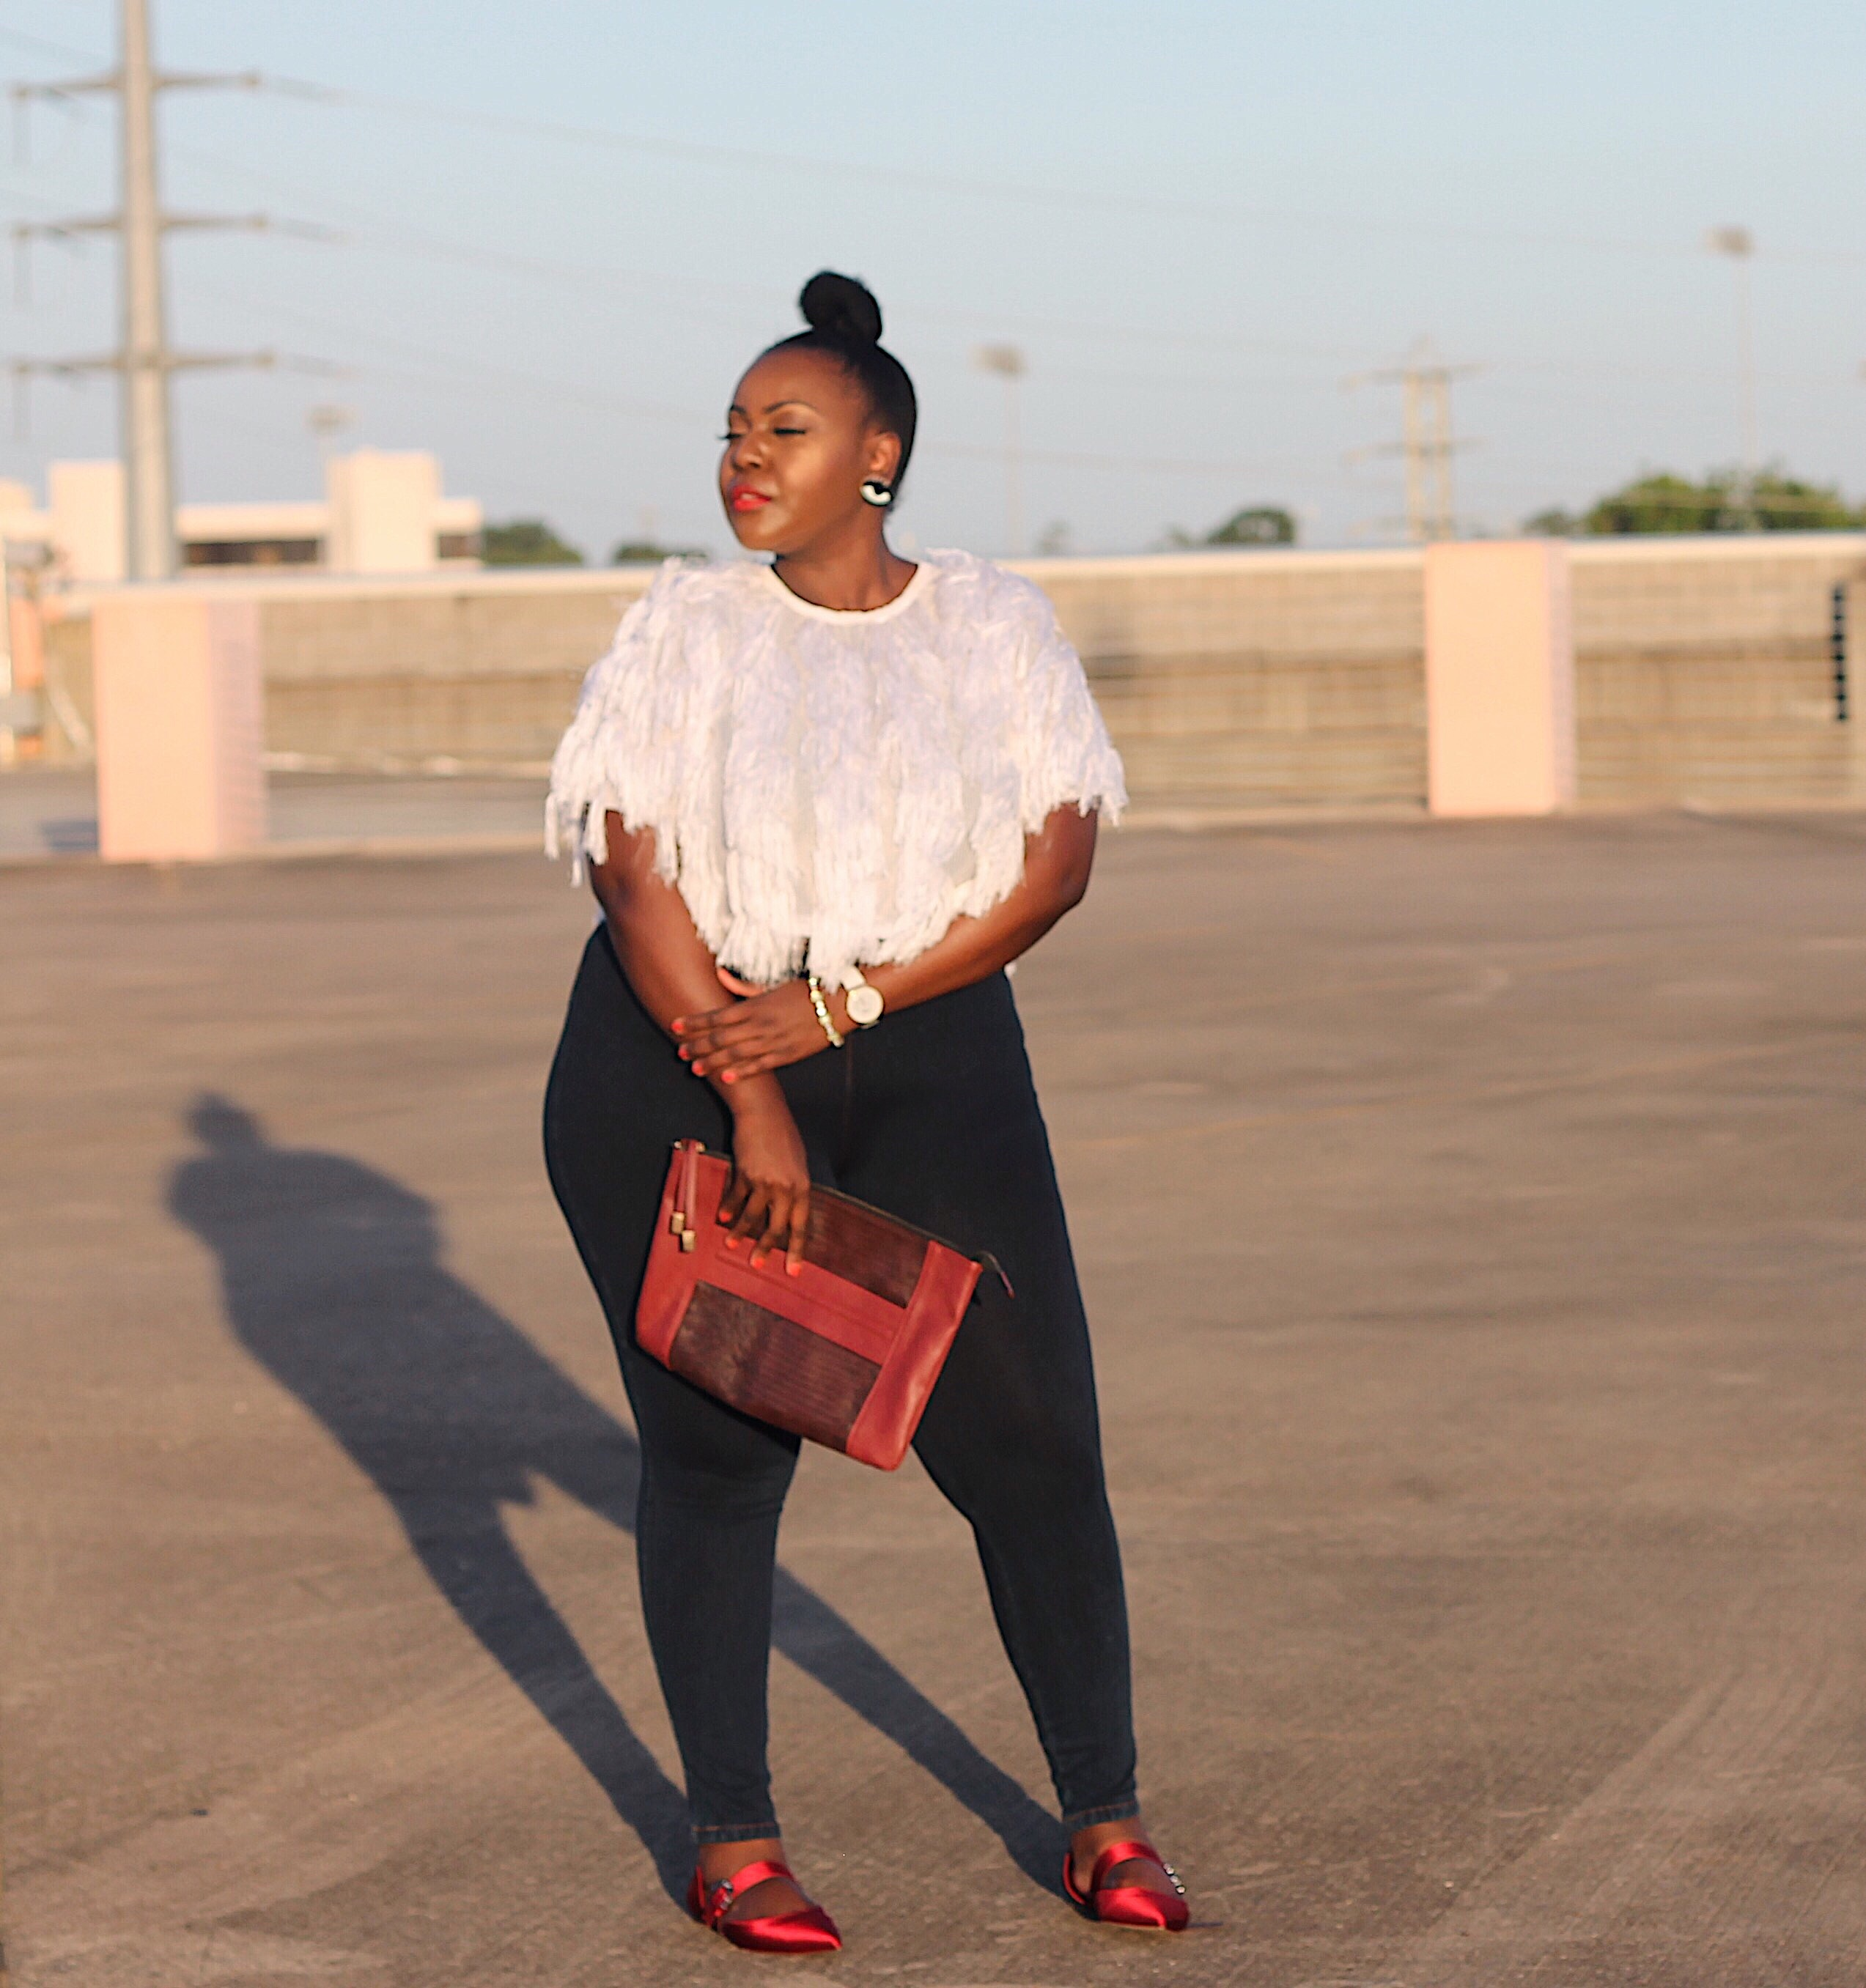 plus size fashion blogs 2017, beautiful curvy girls,how to fill the eye brow of a dark skin,beautiful plus size dark skin girls, plus size black bloggers, clothes for curvy girls, curvy girl fashion clothing, plus blog, plus size fashion tips, plus size women blog, curvy women fashion, plus blog, curvy girl fashion blog, style plus curves, plus size fashion instagram, curvy girl blog, bbw blog, plus size street fashion, plus size beauty blog, plus size fashion ideas, curvy girl summer outfits, plus size fashion magazine, plus fashion bloggers, boohoo, rebdolls bodycon maxi dresses, Melody Ehsani fhonia ellis zara satin ballerinas faux fur Lyssè